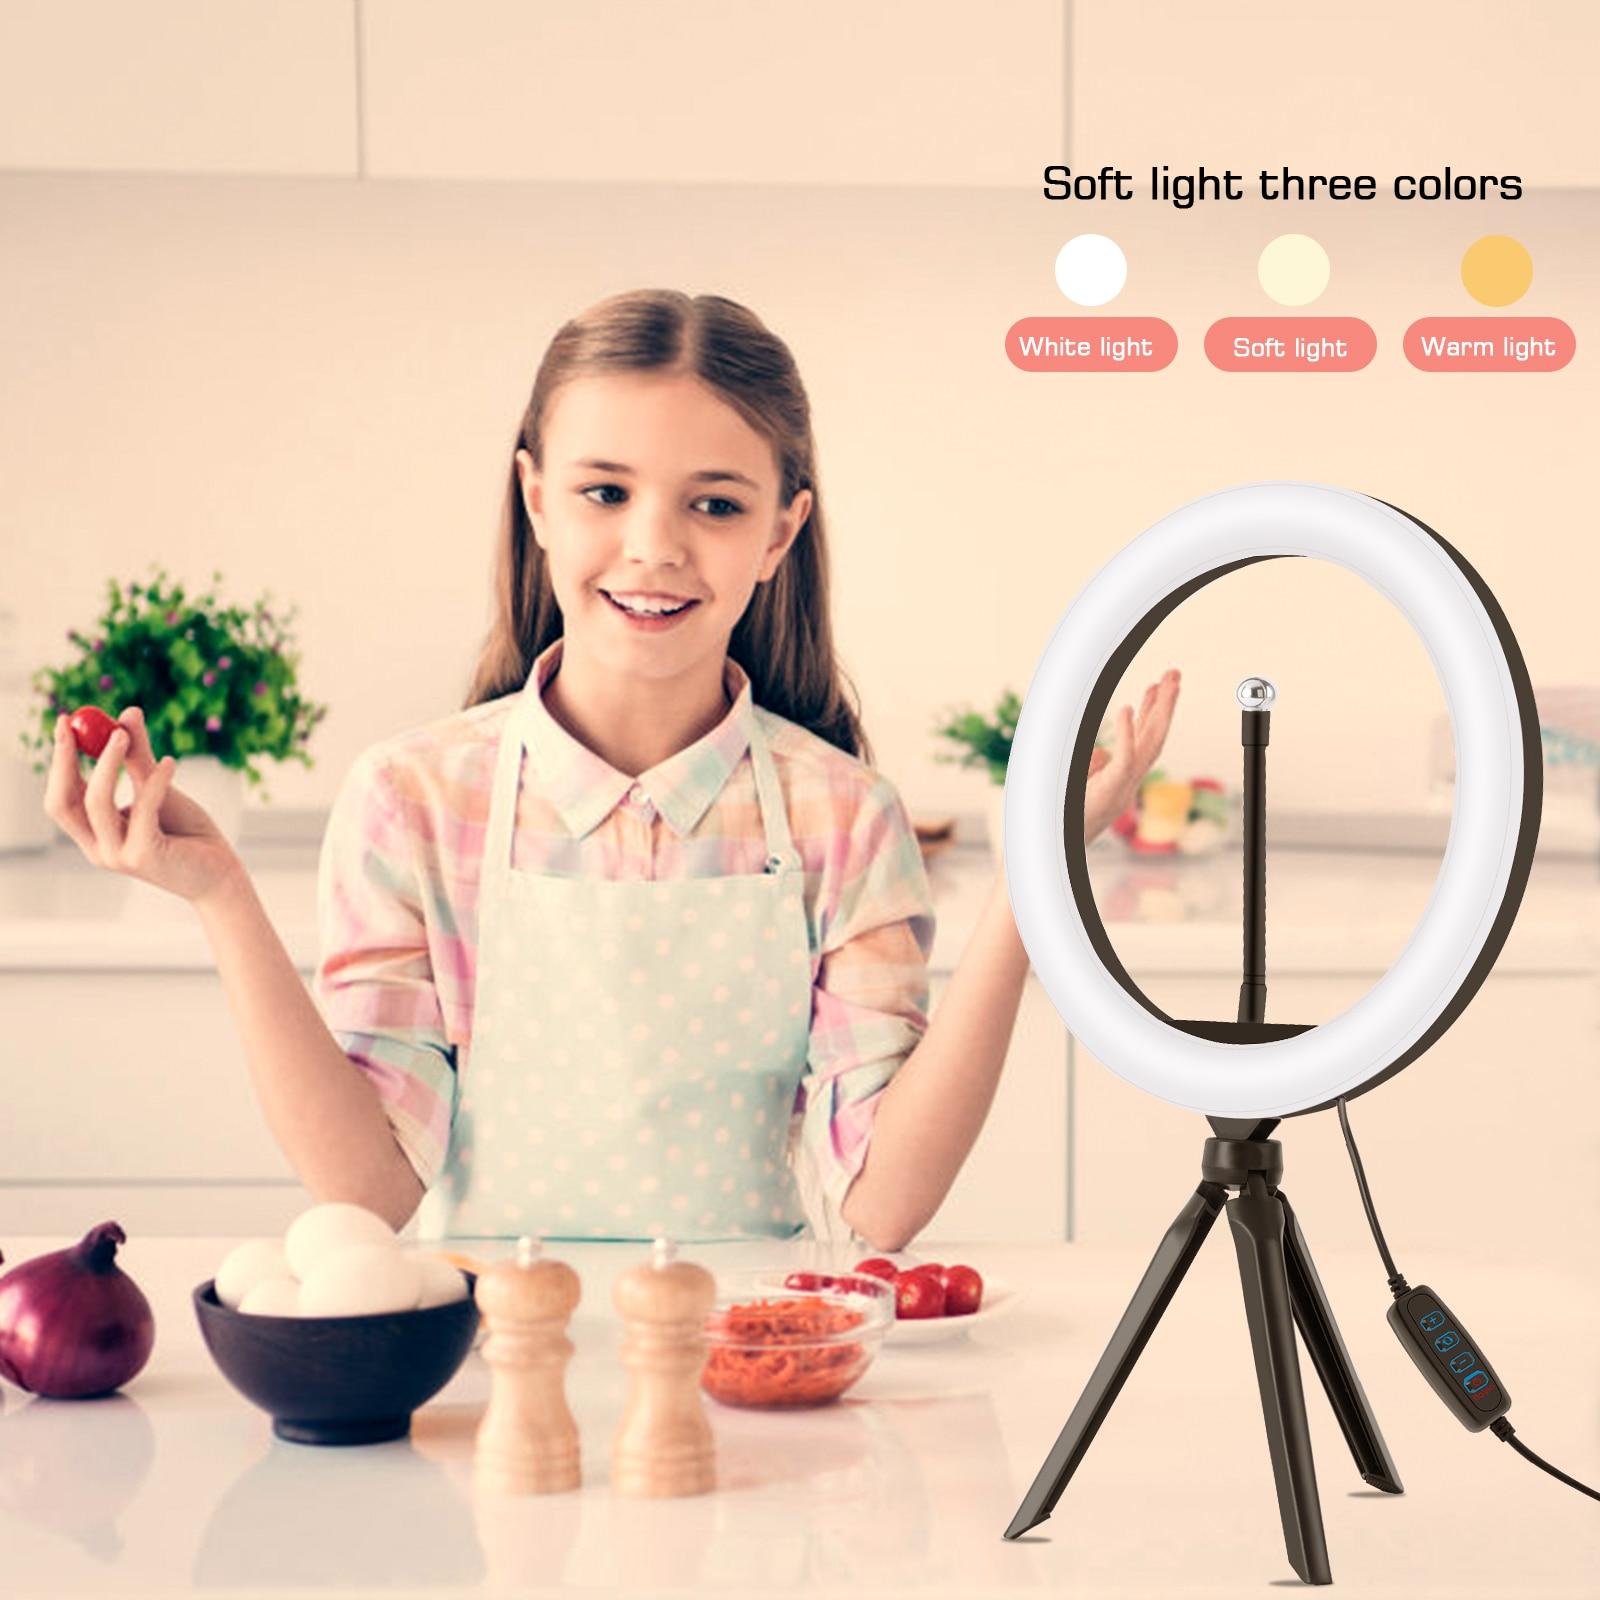 Photograph LED Fill light Diameter 26CM Dimming Lighting Beauty Lamp With Bracket Mobile Phone Clip Multifunctional Tablet